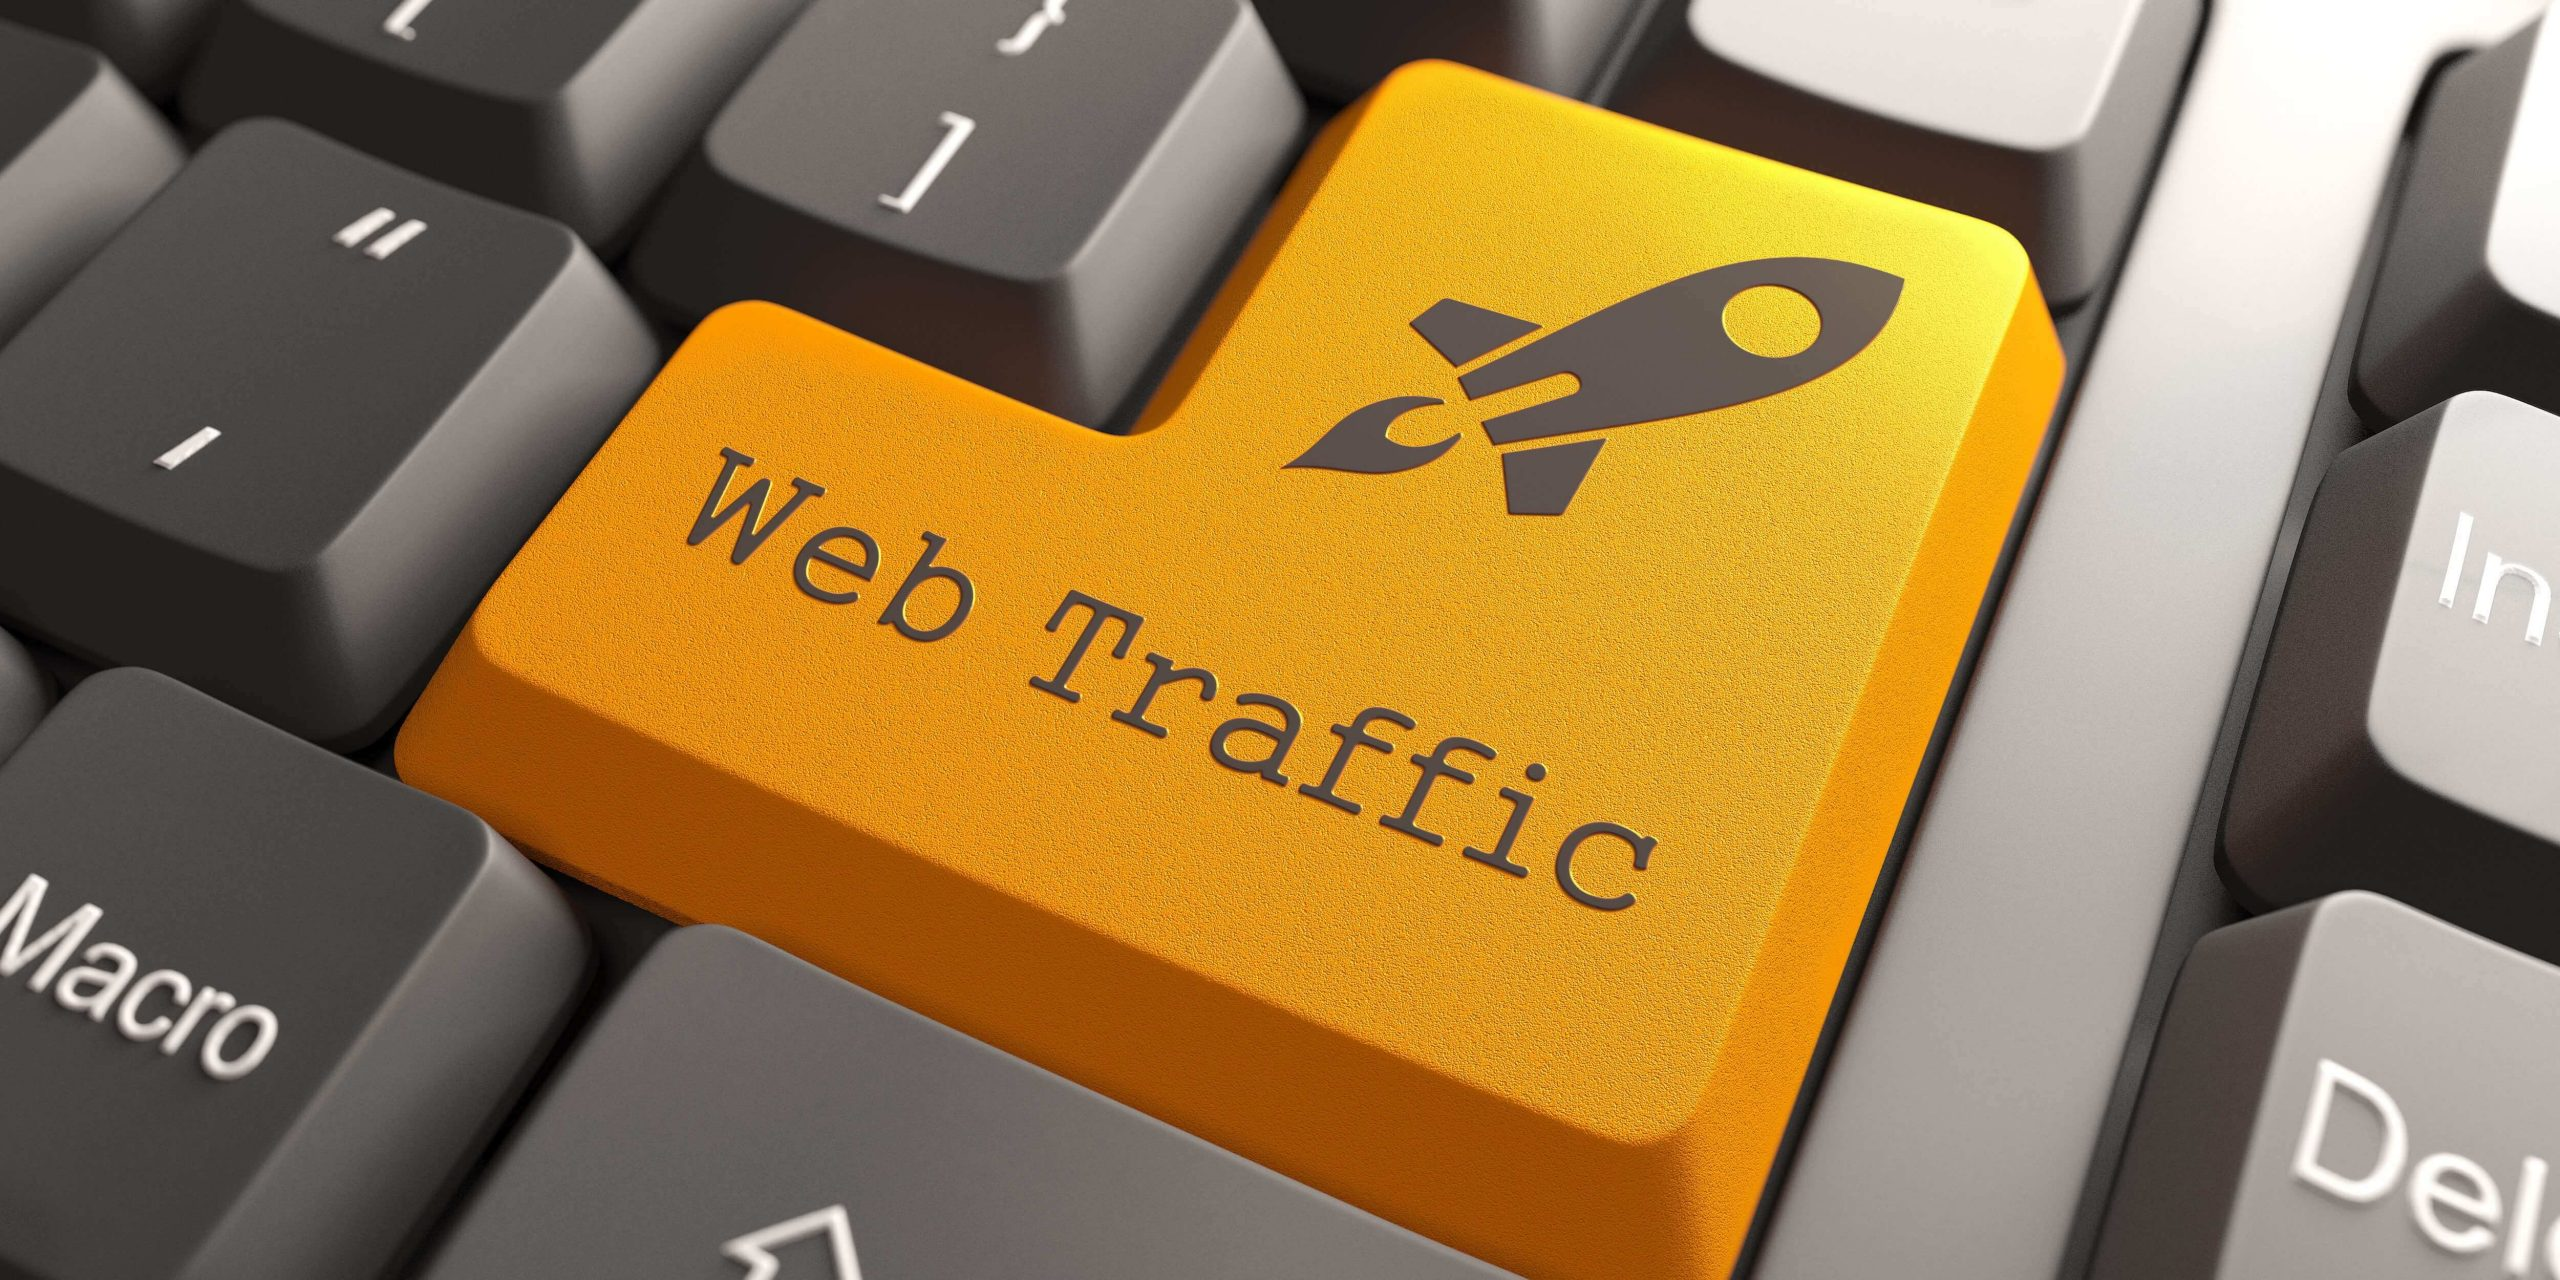 Cara Meningkatkan Traffic Website - 15 Panduan Sederhana dan Efektif